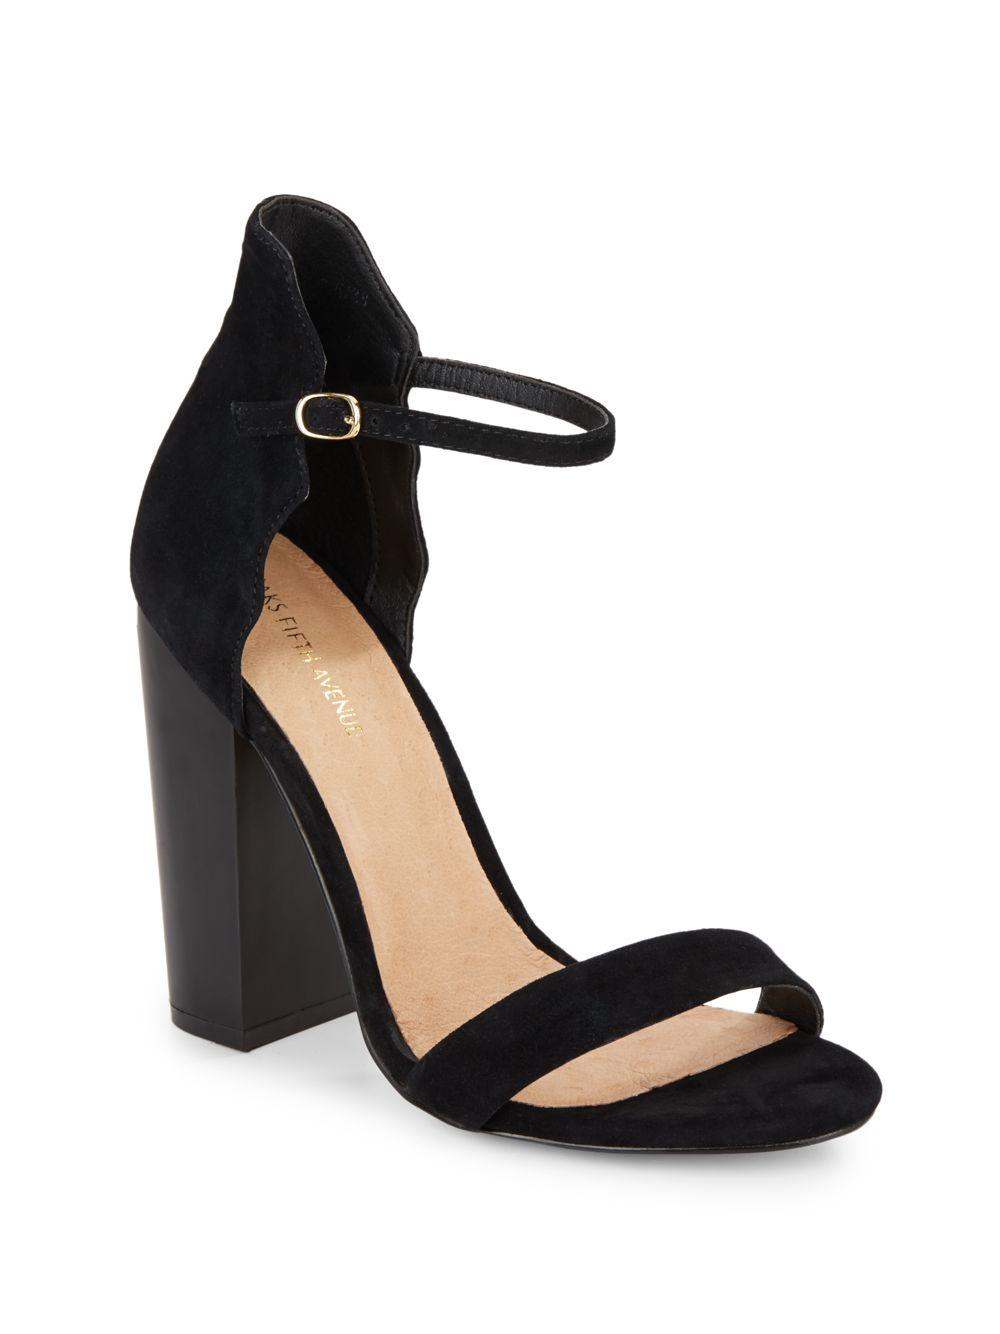 7f22c6c97b31 Lyst - Saks Fifth Avenue Suede Sandals in Black